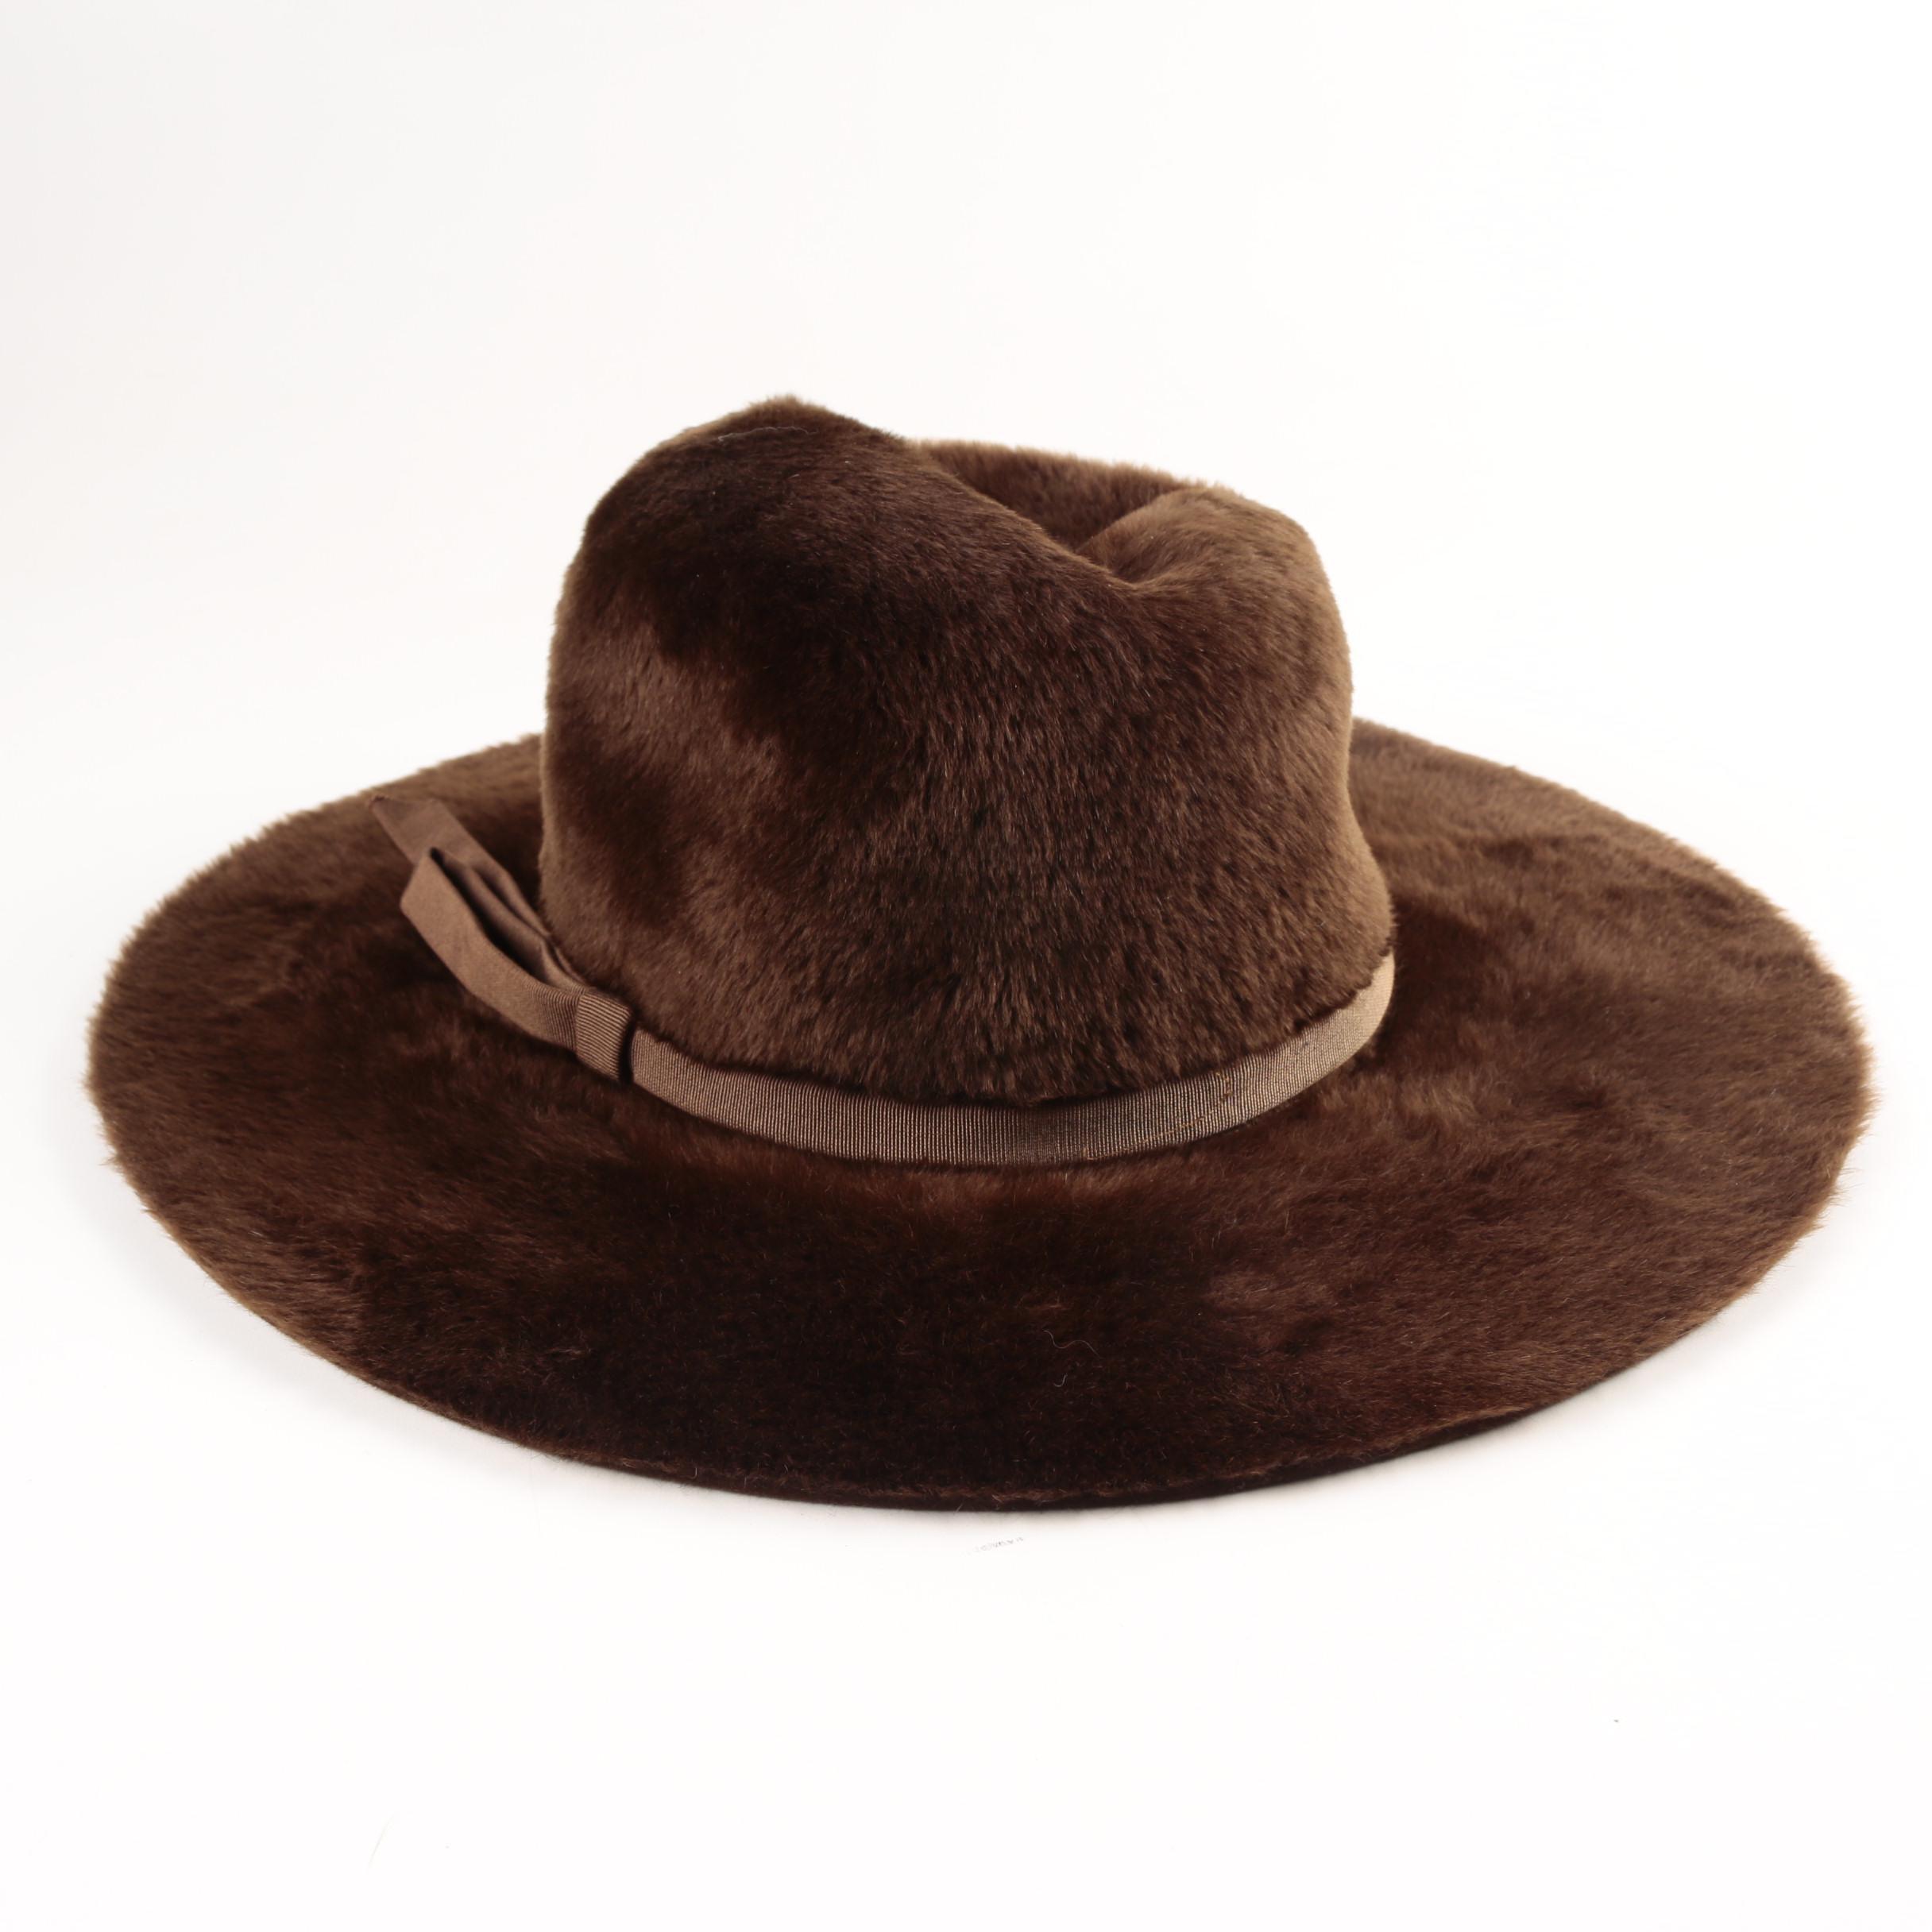 Circa 1960s Vintage Felted Beaver Fur Hat